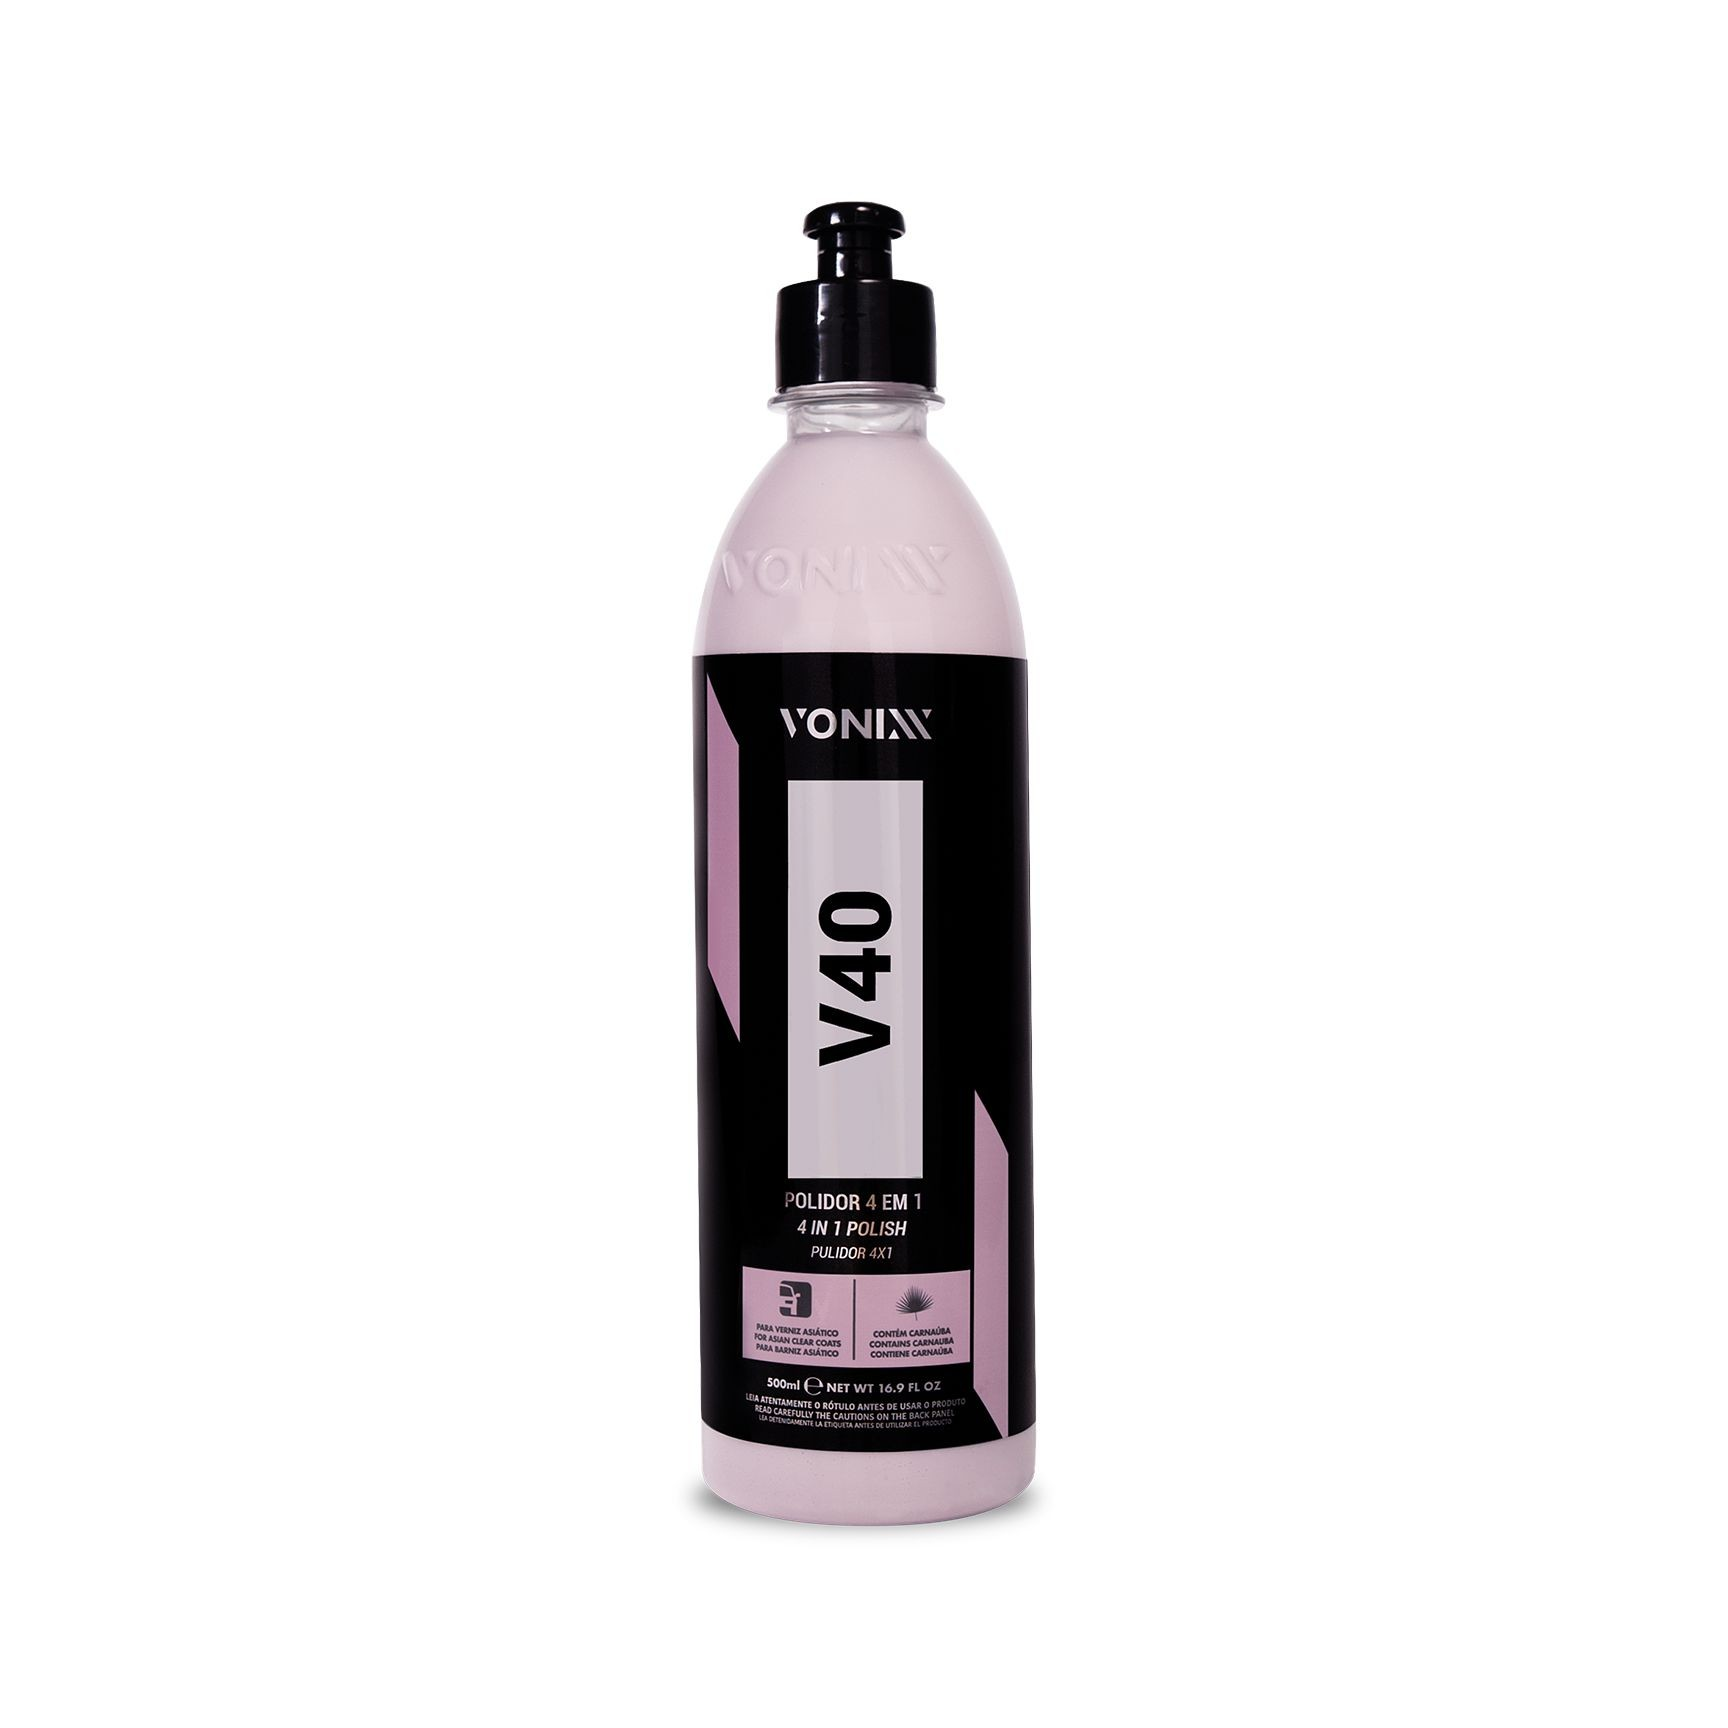 Vonixx V40 Expertise Sciense - 4 em 1 - 500ml  - Loja Go Eco Wash